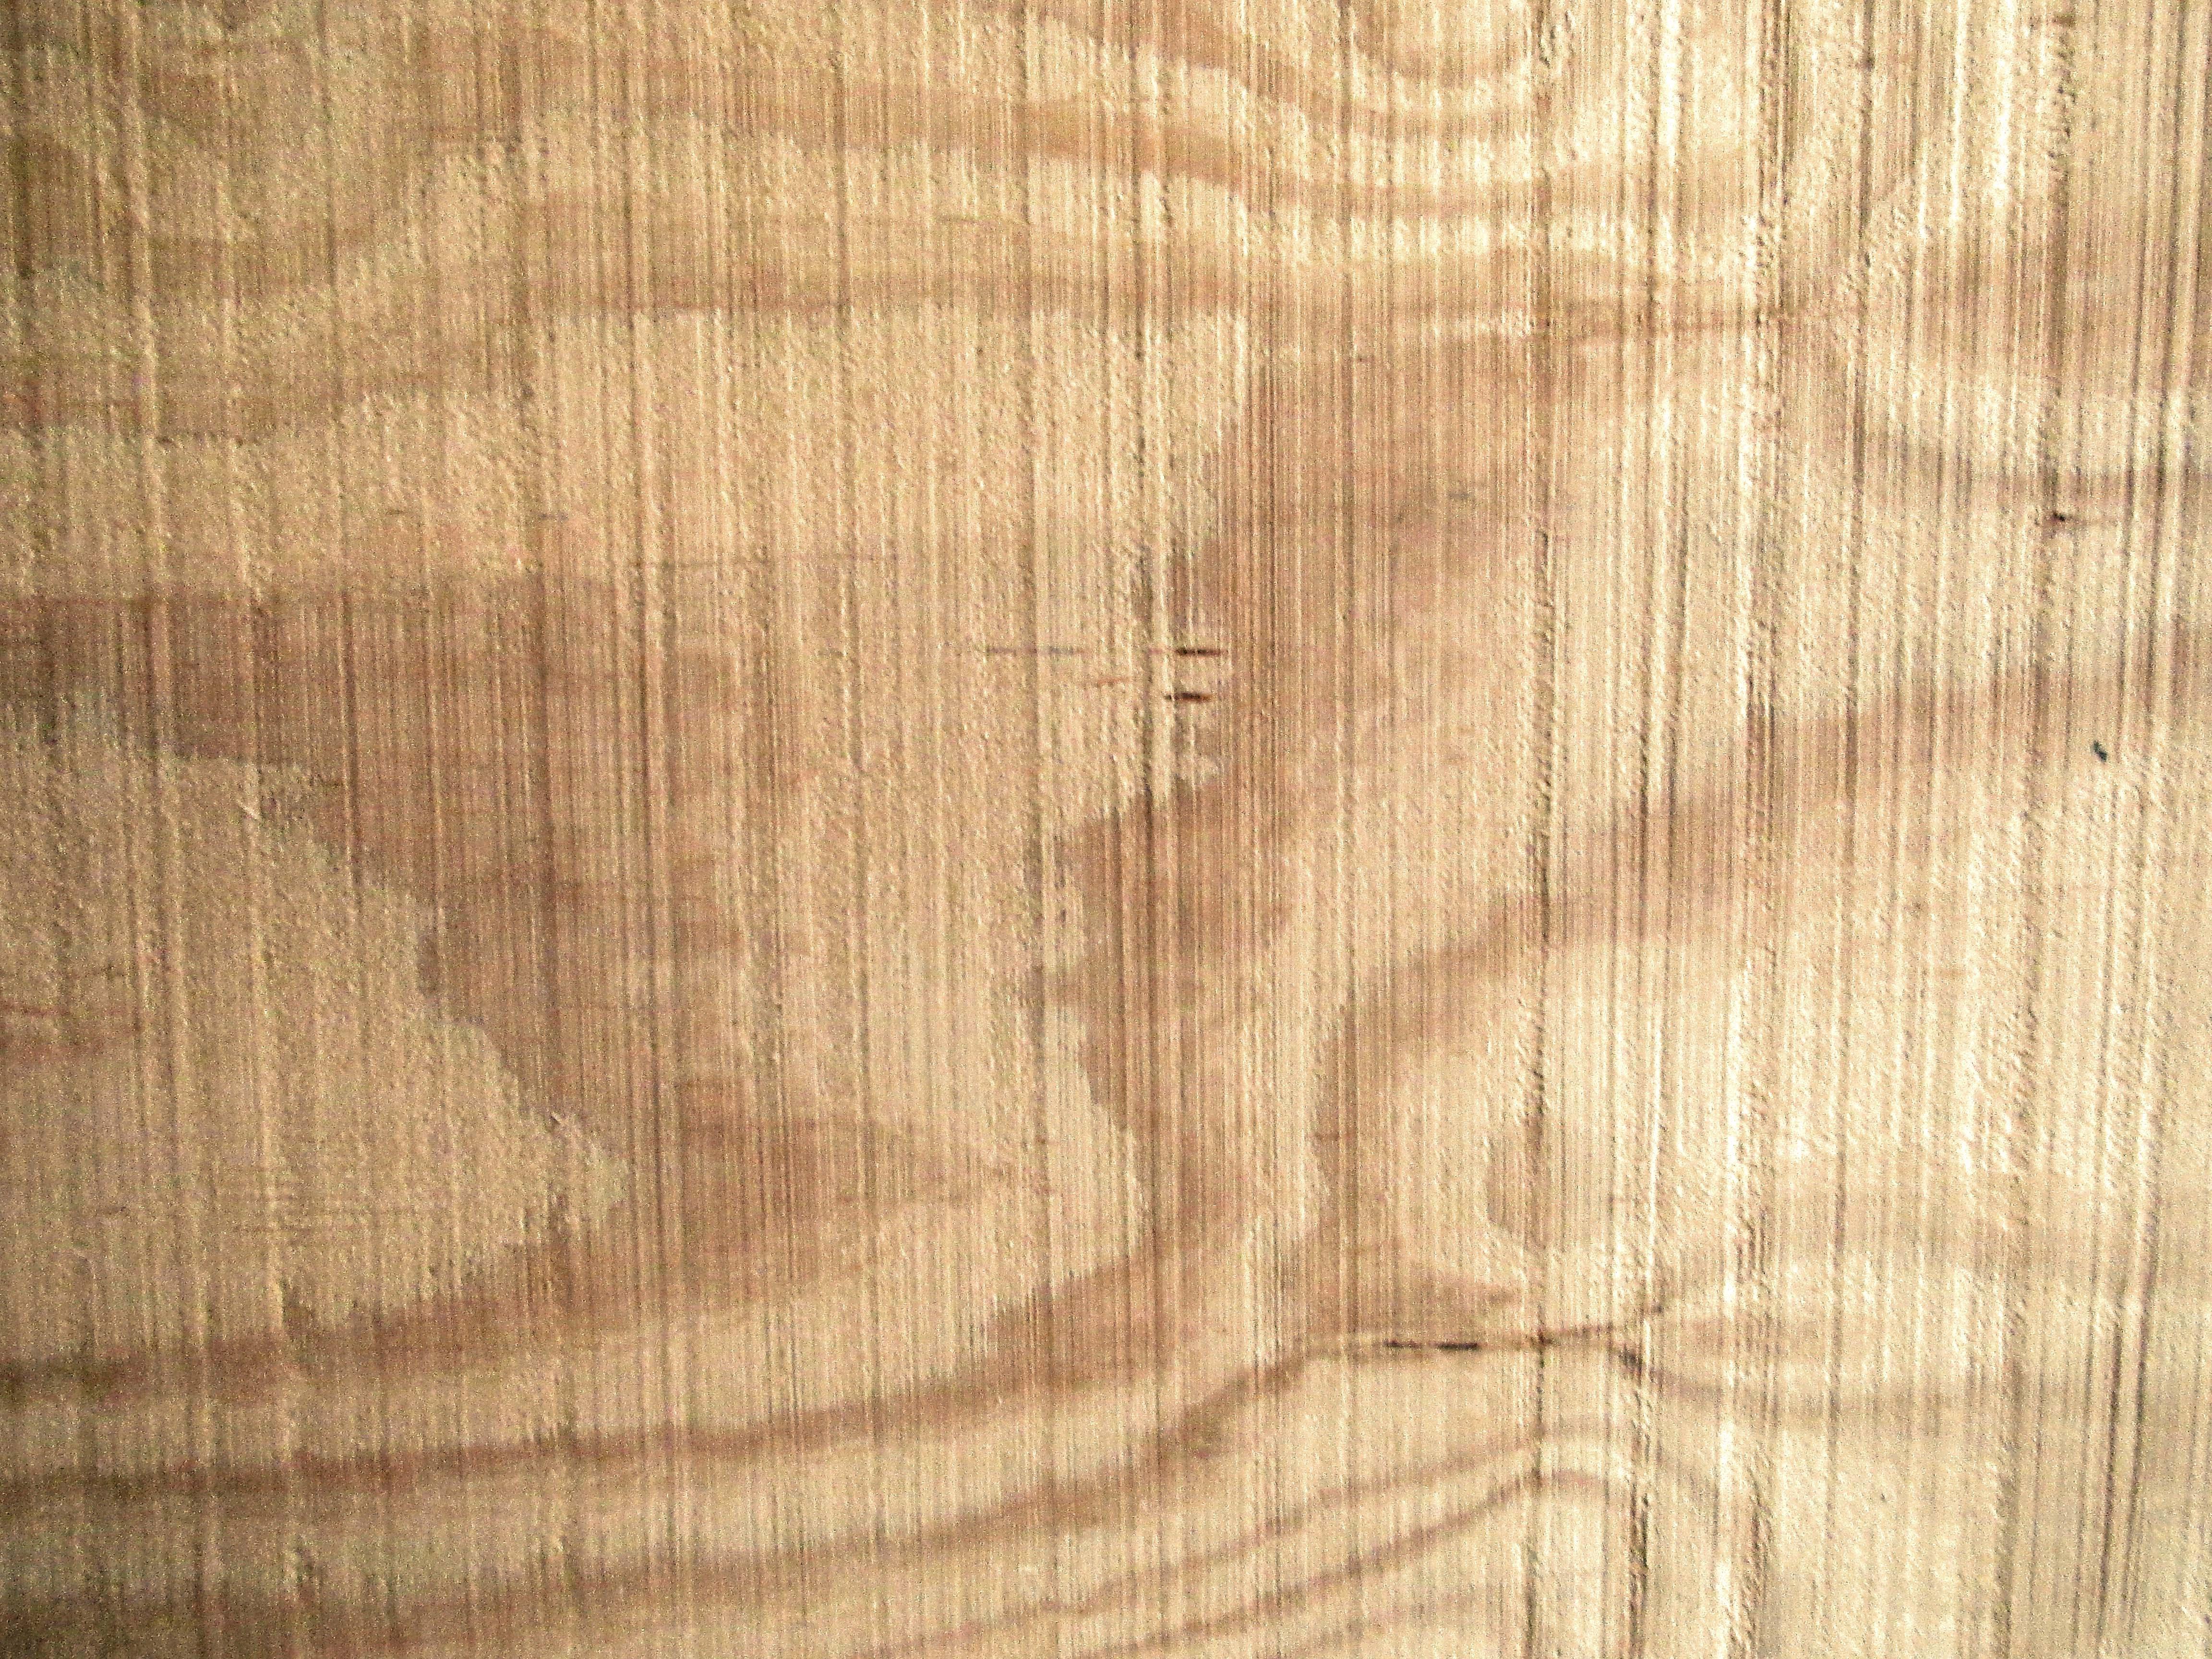 4X8 PINE ROUGH FLUSH Exterior Siding Panel - Capitol City Lumber